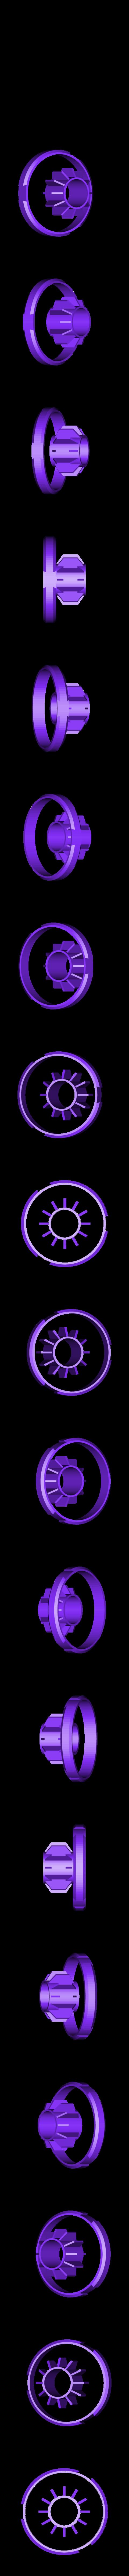 bhl-headlight-b.stl Download free STL file NeoPixel Bike Light • 3D printer template, Adafruit